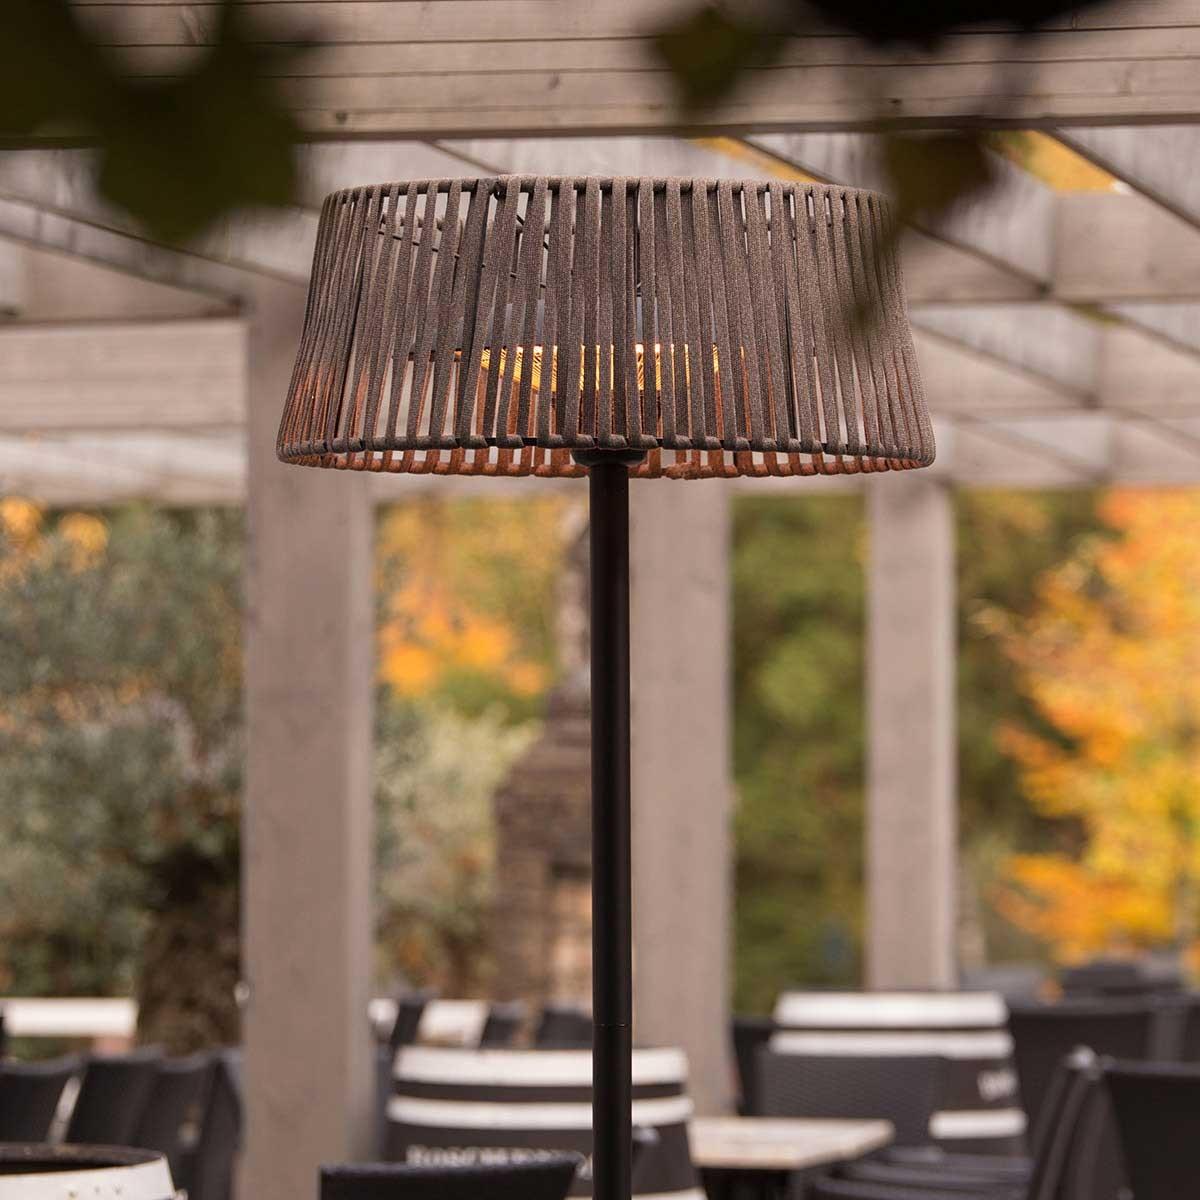 Lampadaire chauffant en corde Artix 2100 W halogène avec LED - Sunred